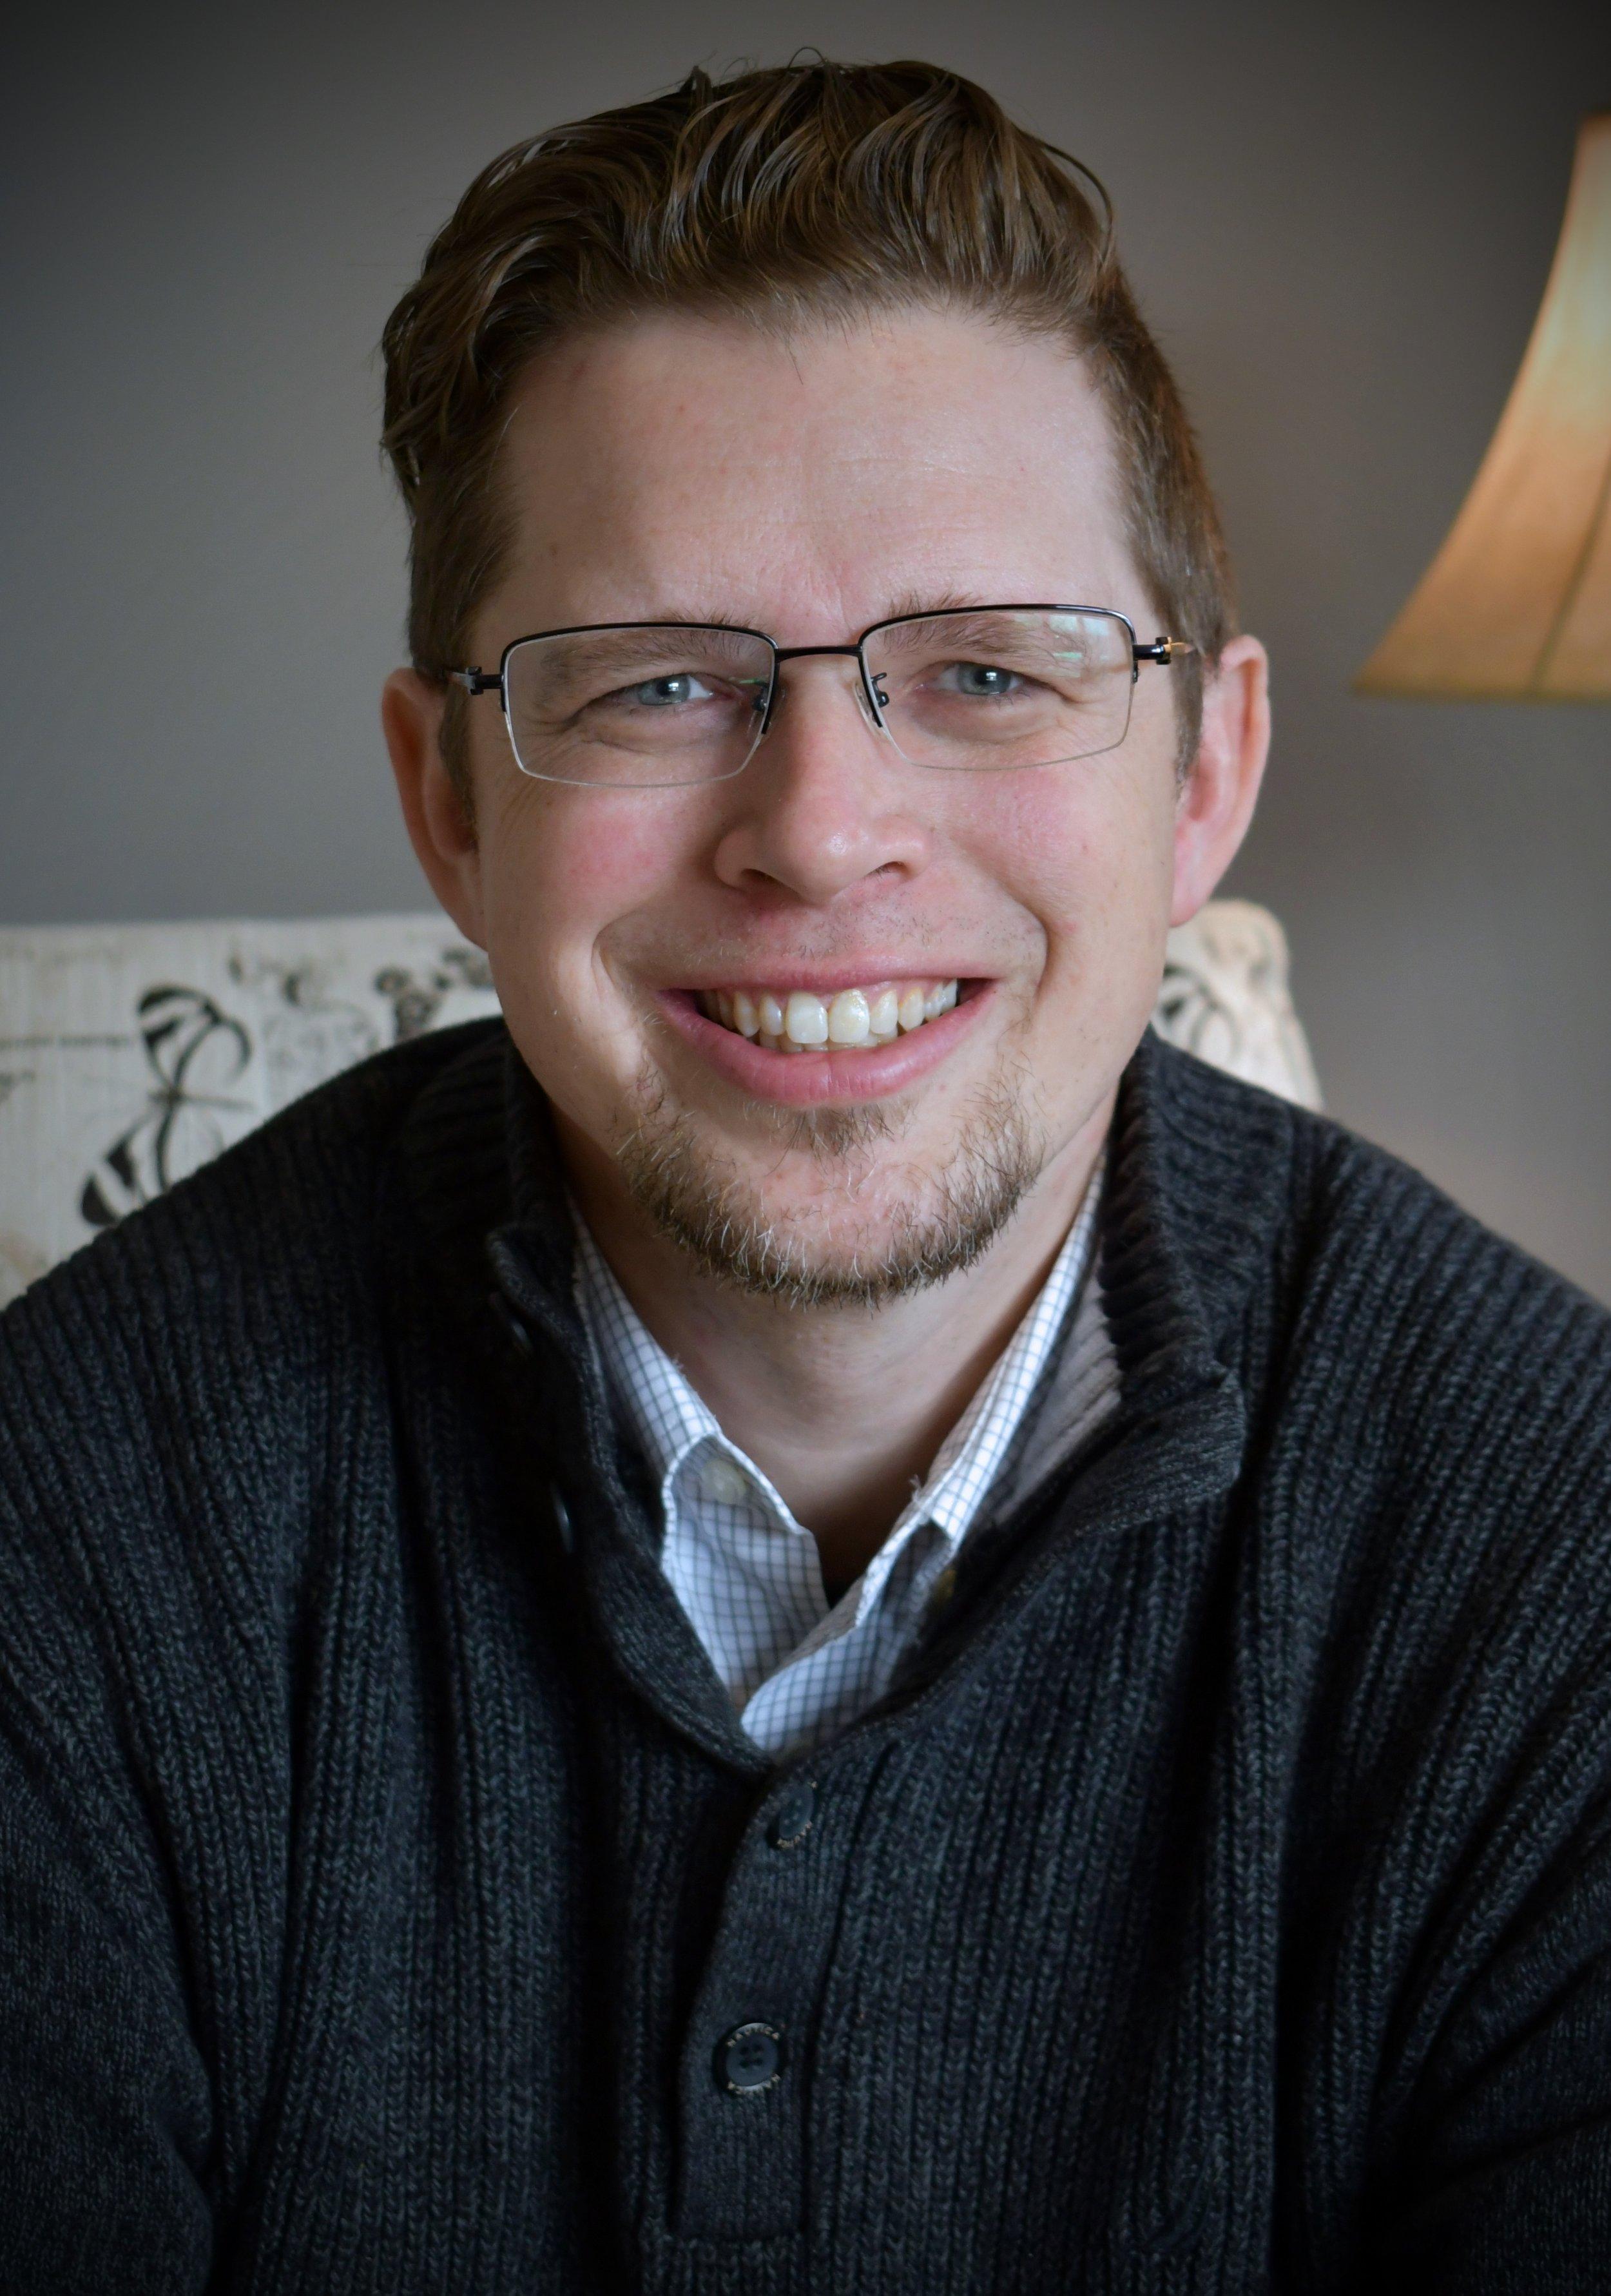 Jonathan McGuire Headshot 1.jpg